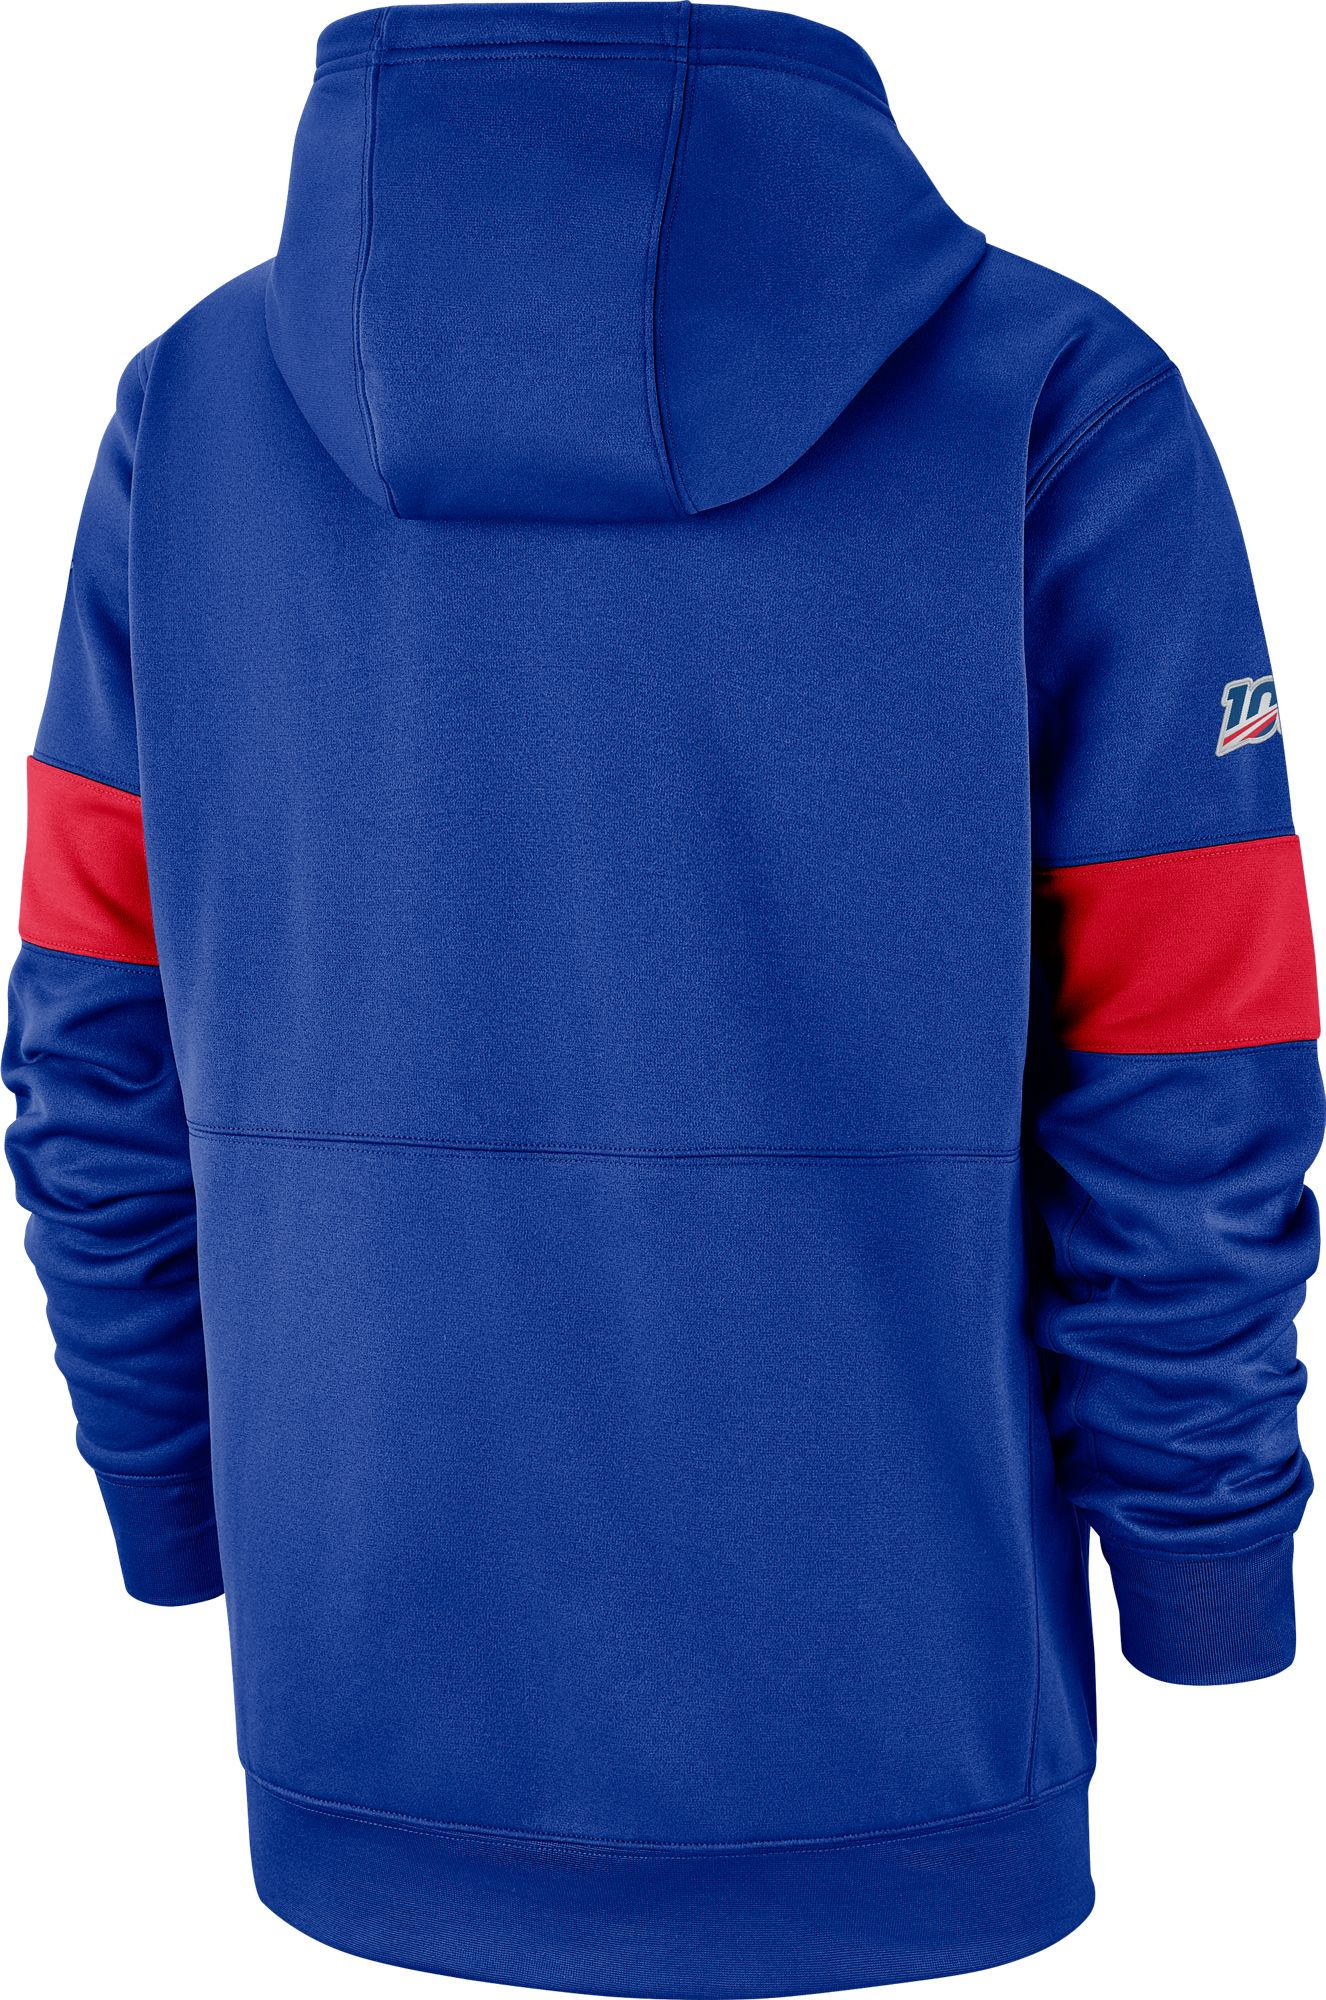 buffalo bills men's sweatshirt